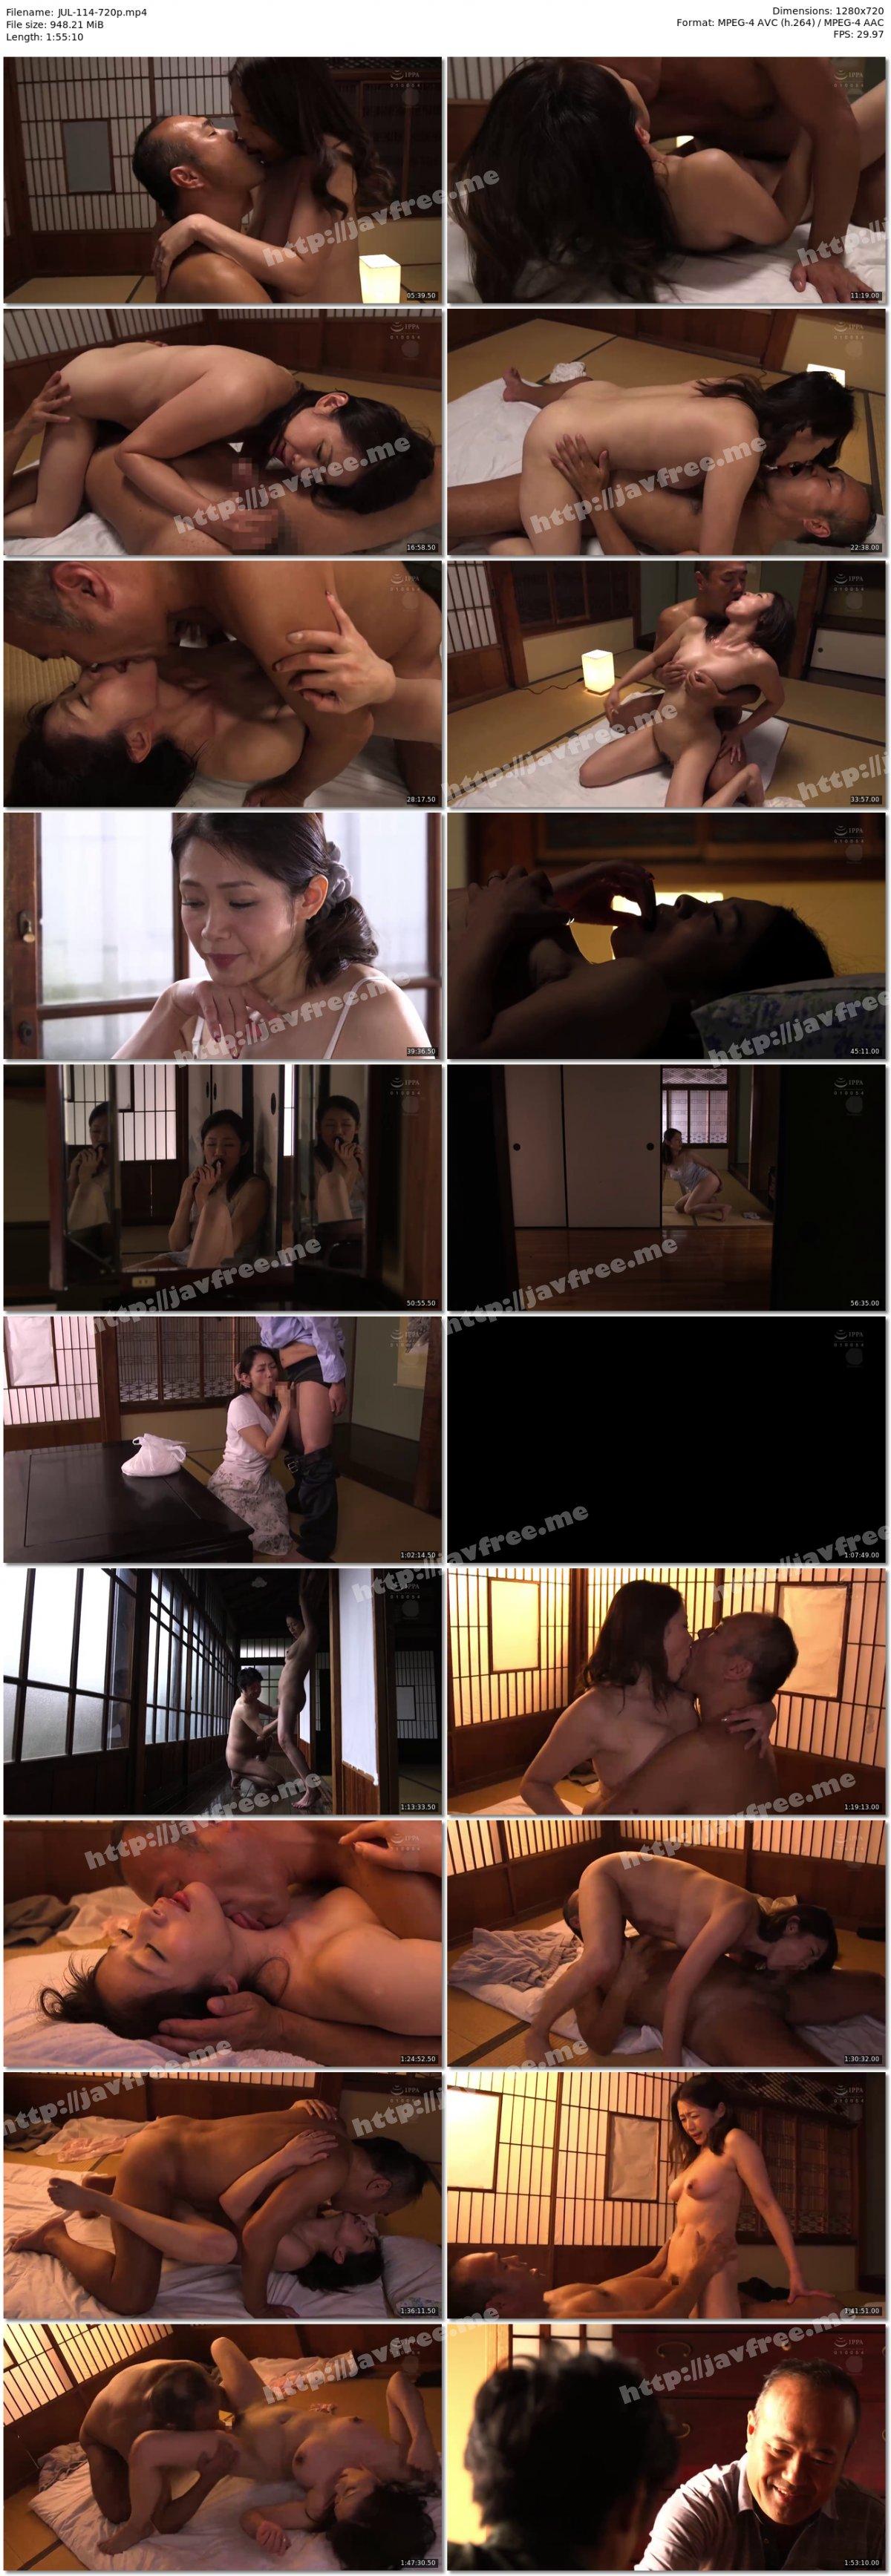 [HD][JUL-114] ずっと…ずっと…、あなたに逢いたかった…。 ~愛欲、情欲、性欲、全ての欲望を解き放つ汗だく中出し性交~ 友田真希